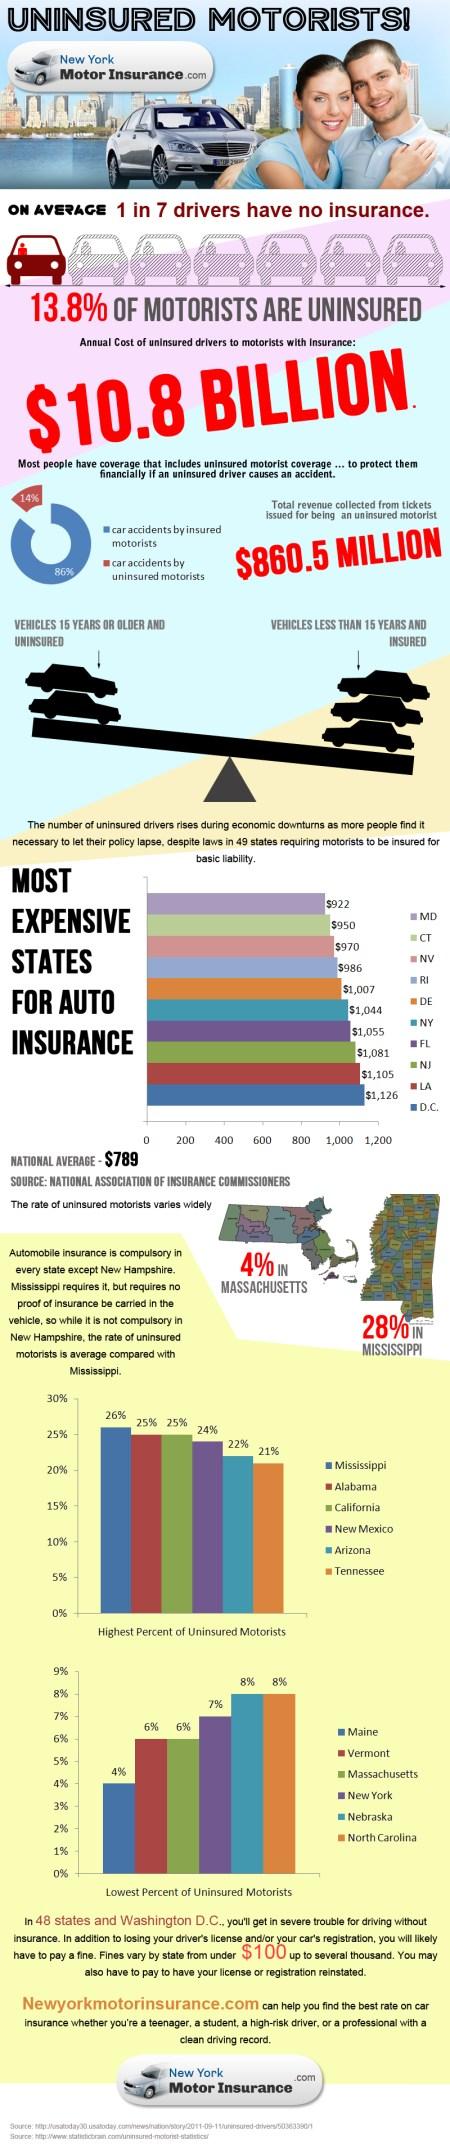 Uninsured Motorists Identification Directory